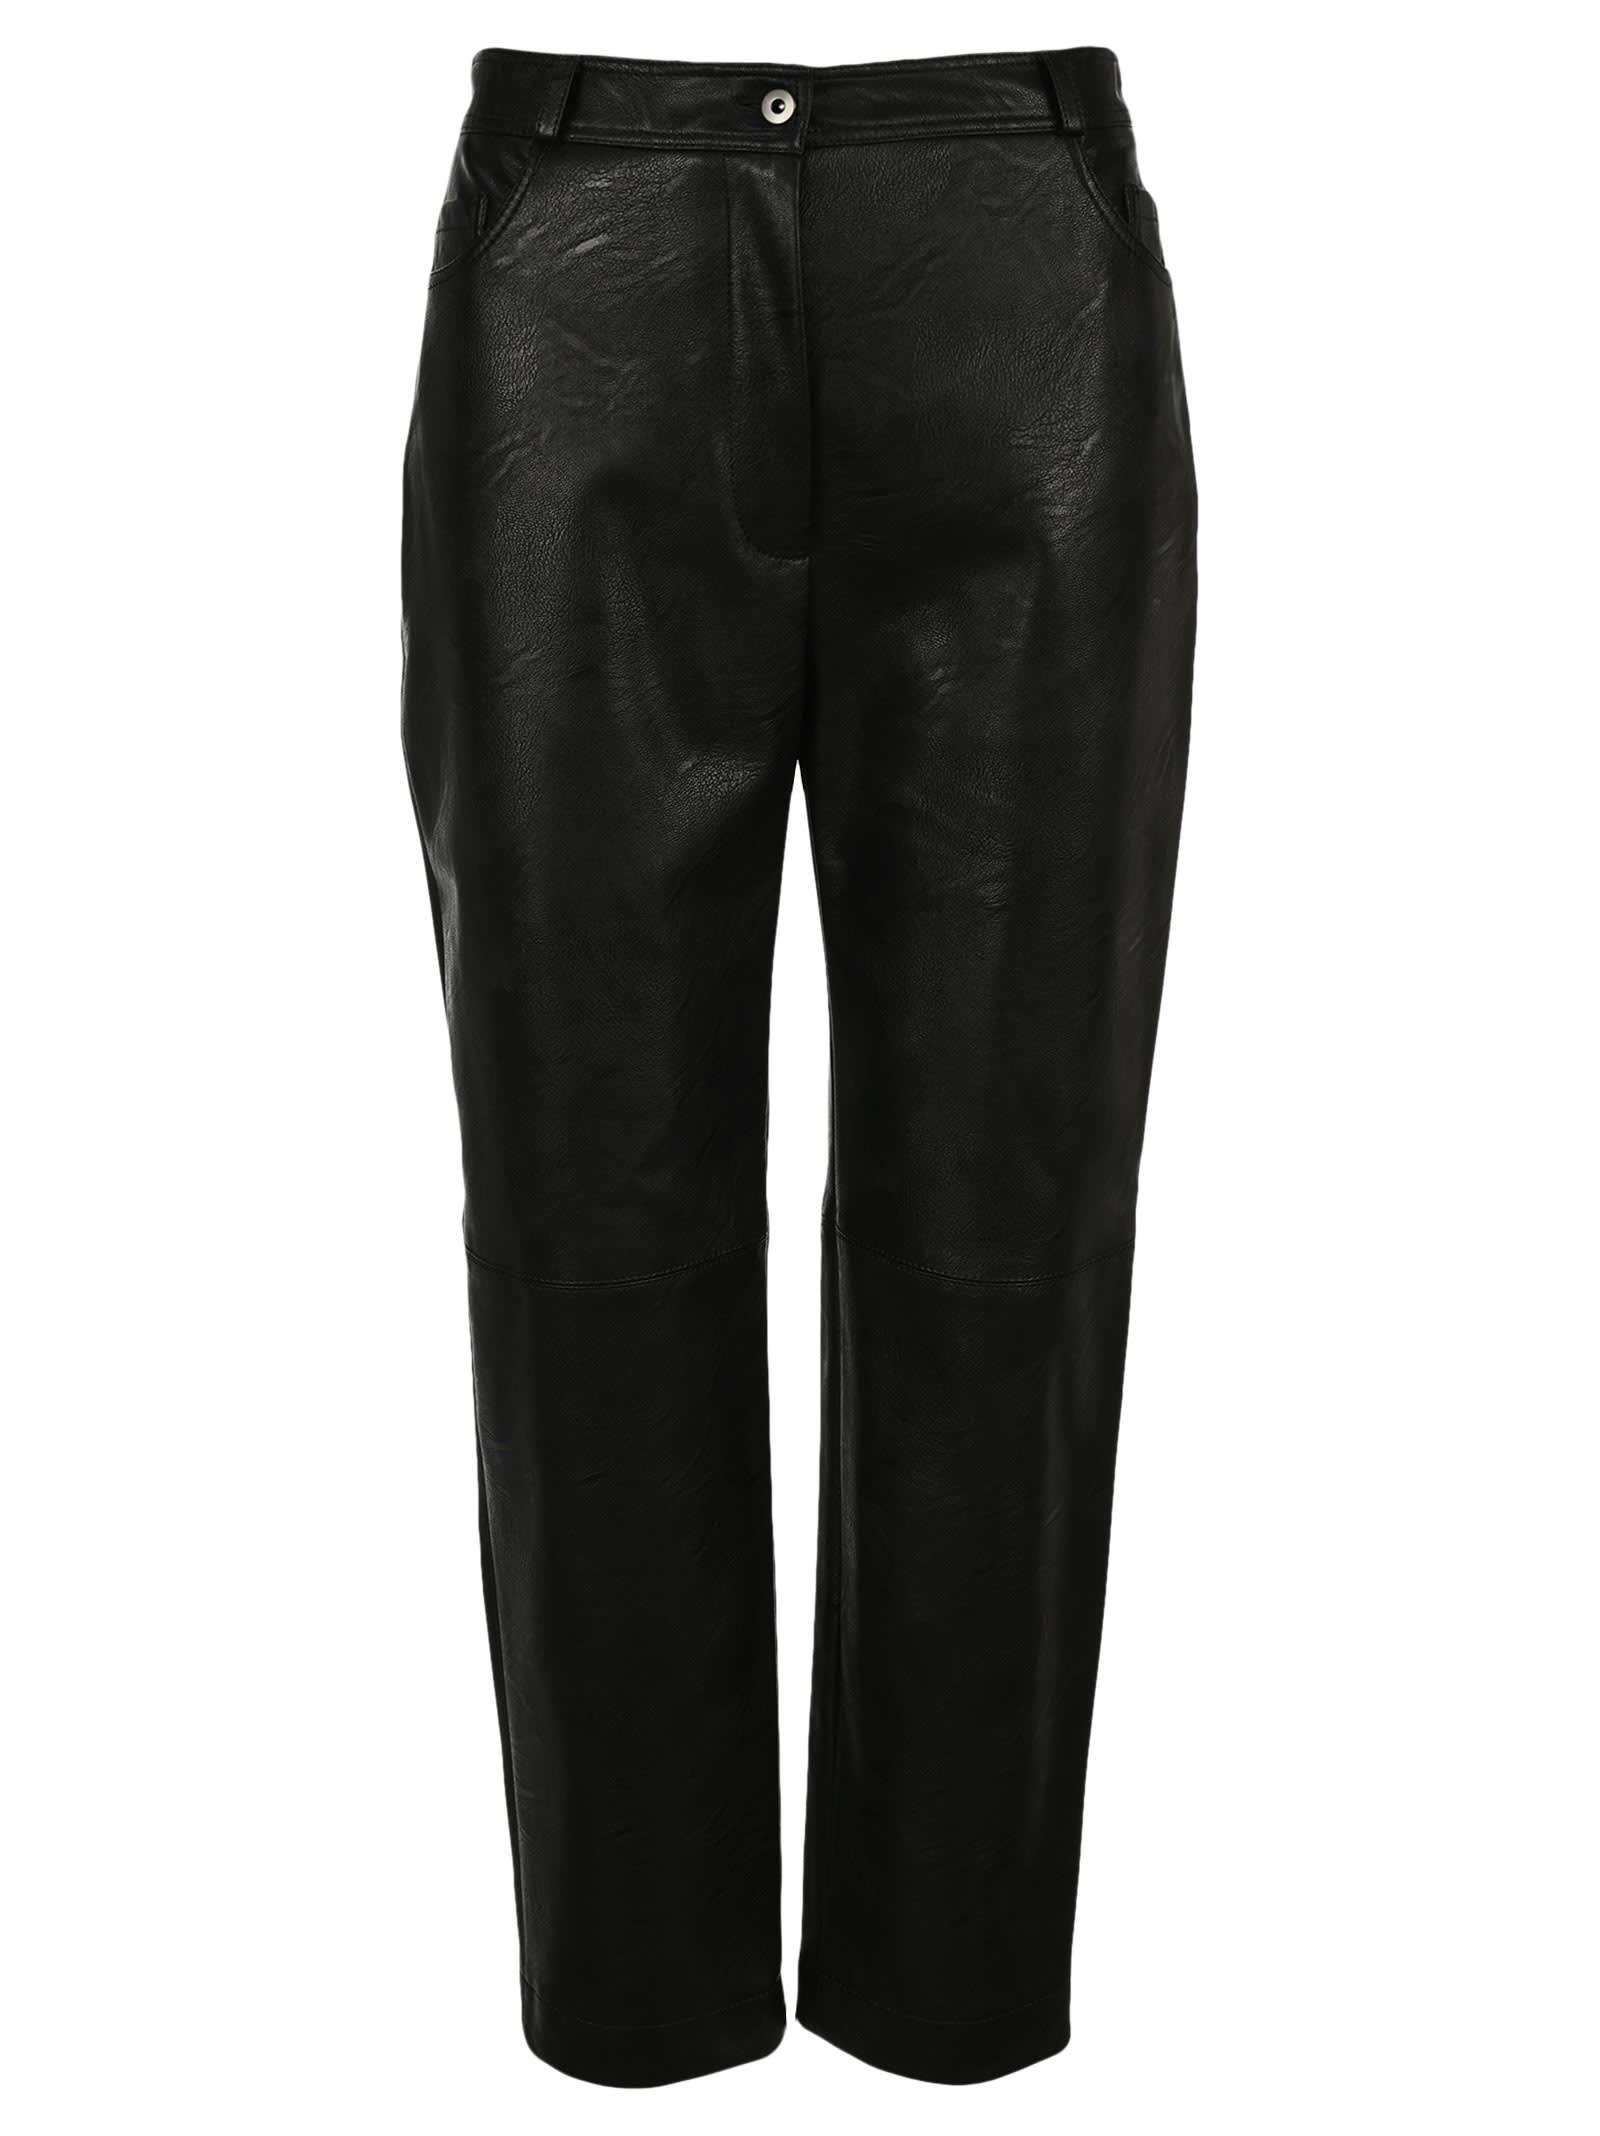 Stella Mccartney Eco Leather Pants